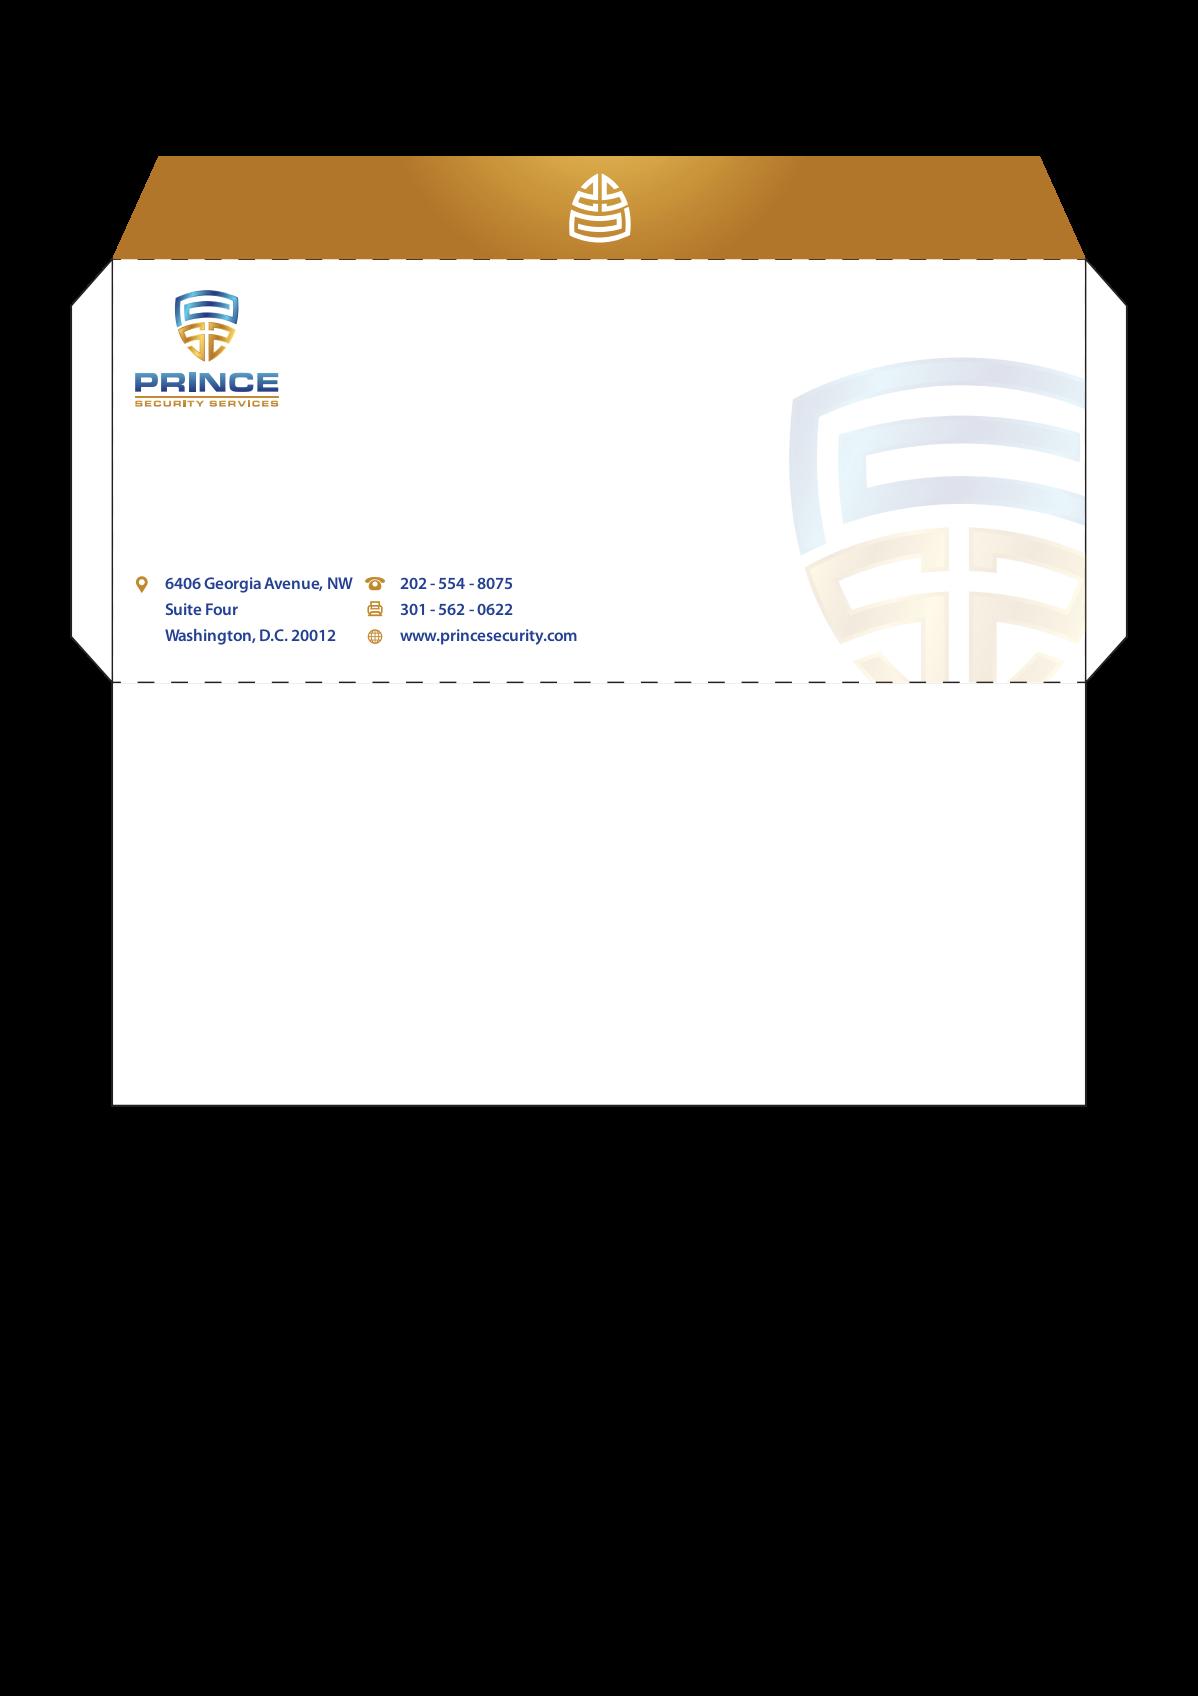 New Address on letterhead